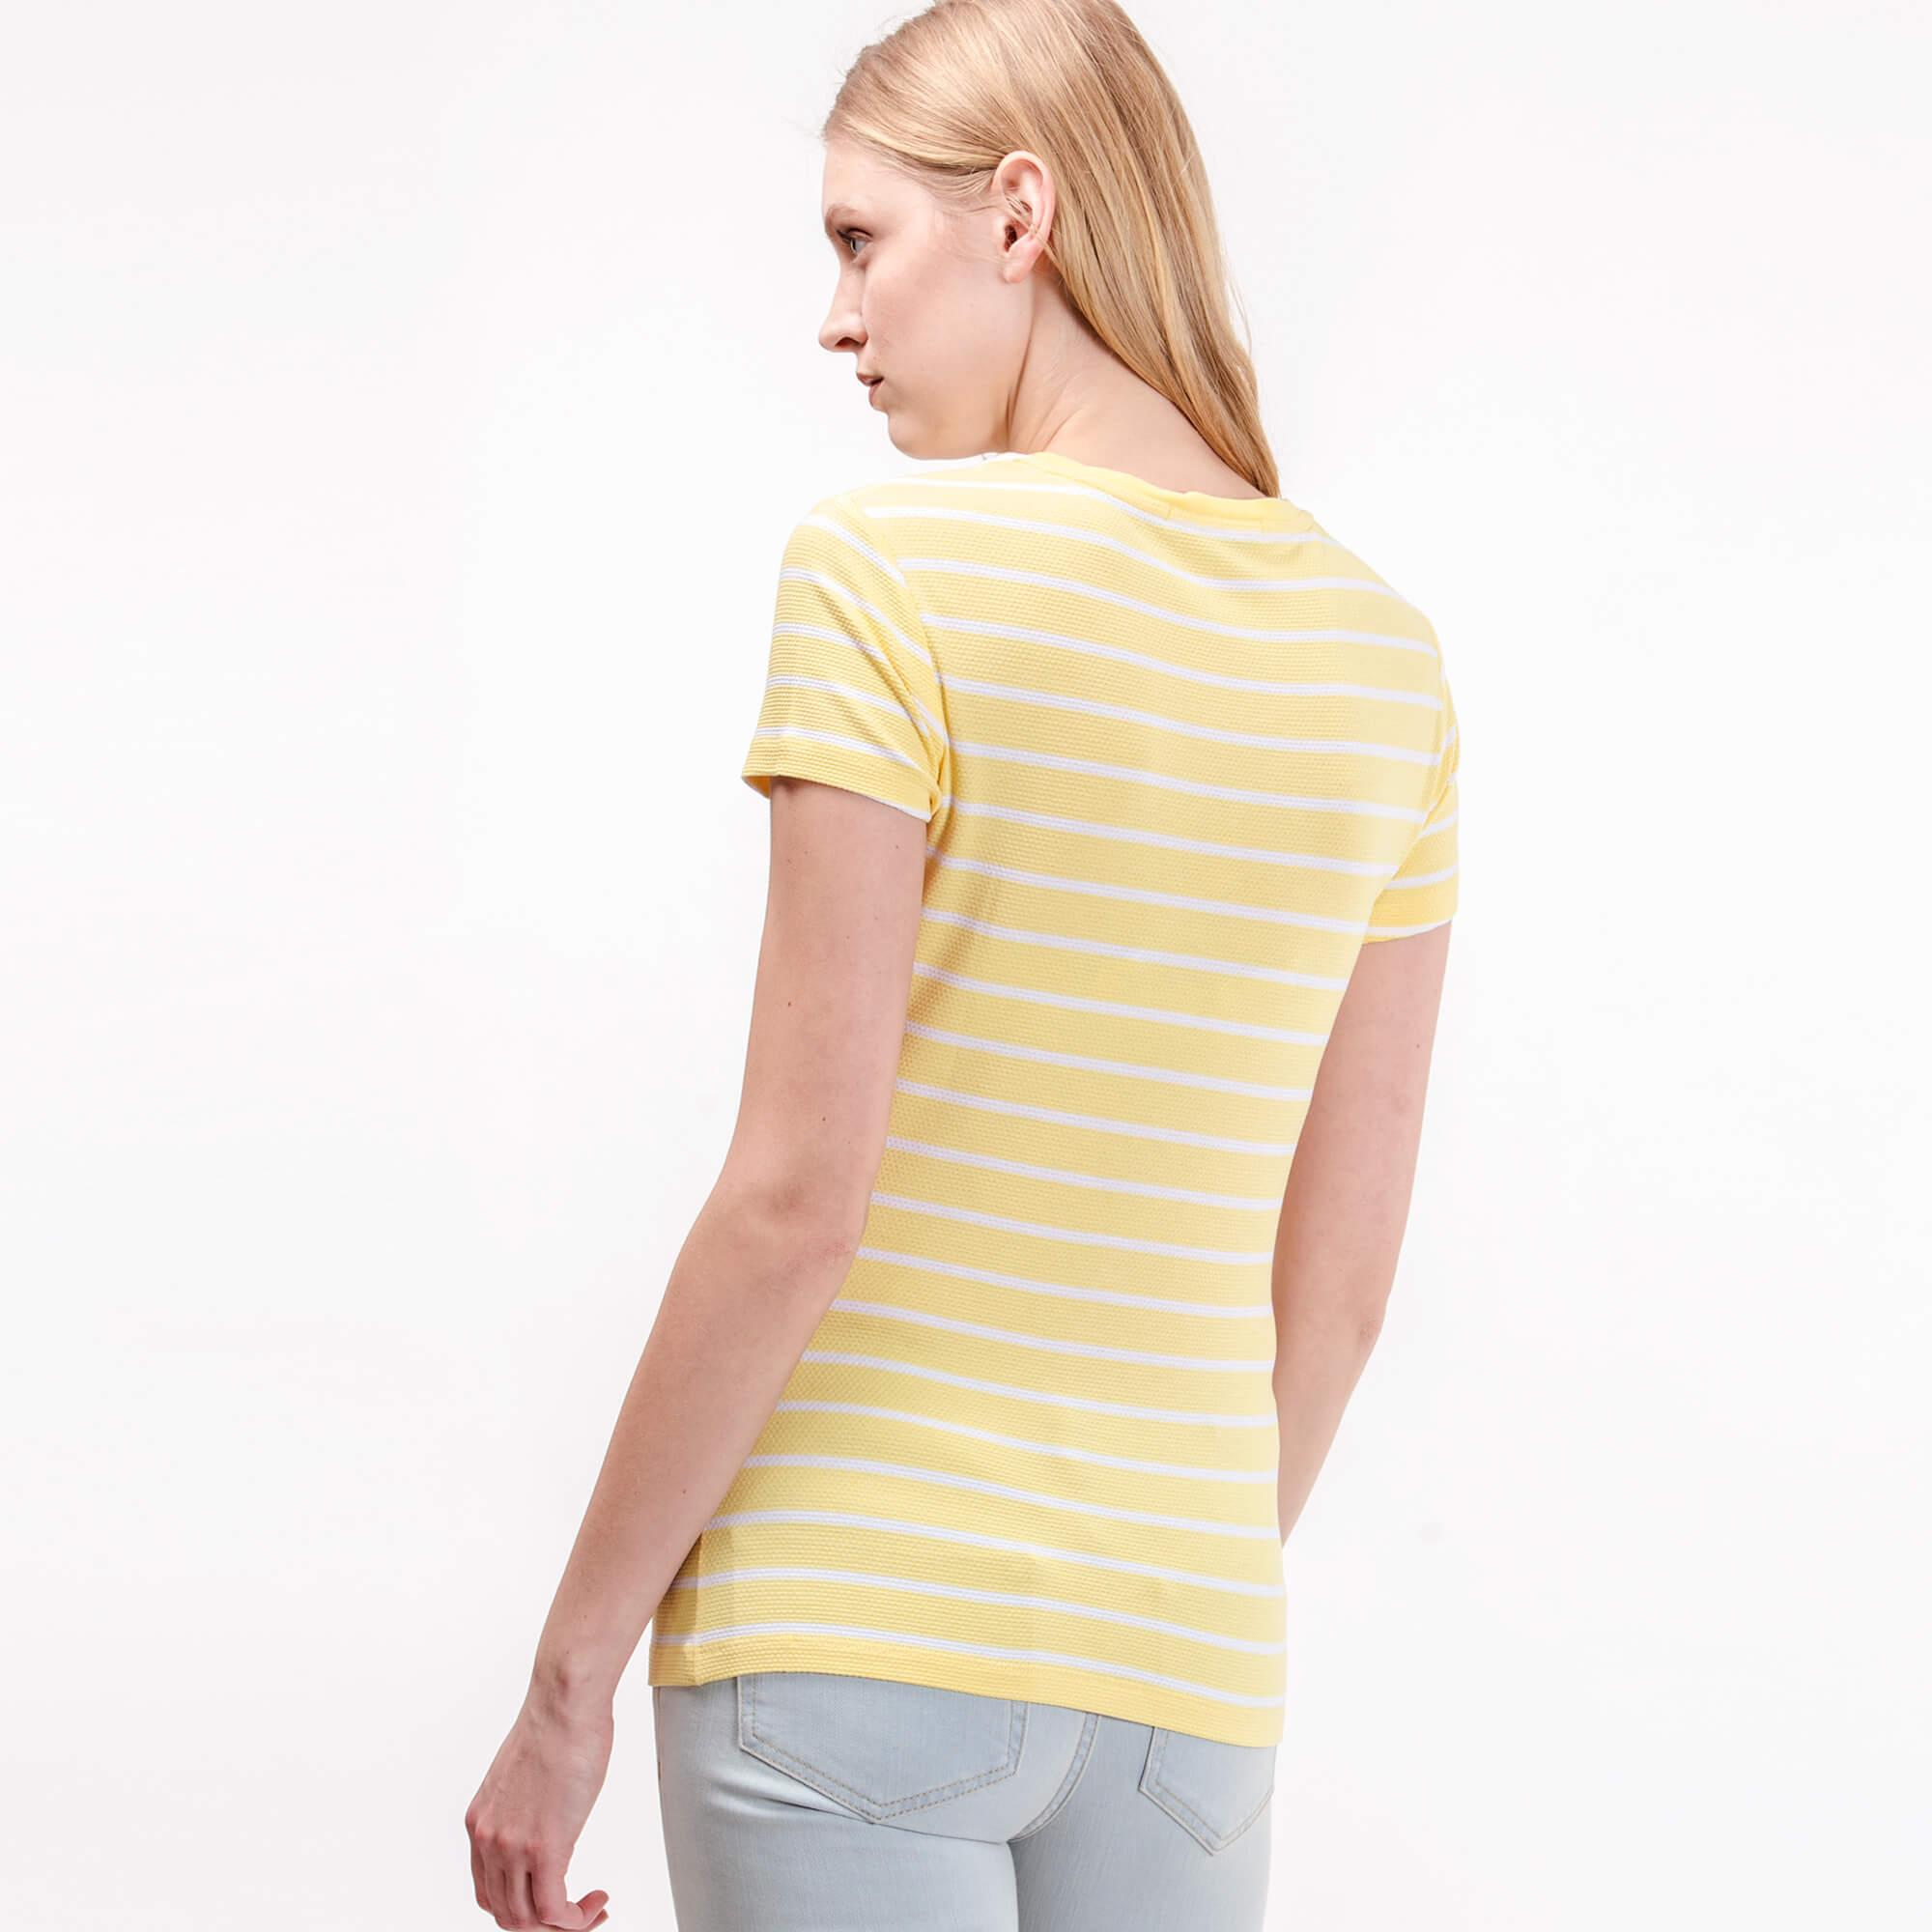 Lacoste Kadın Sarı Çizgili T-Shirt